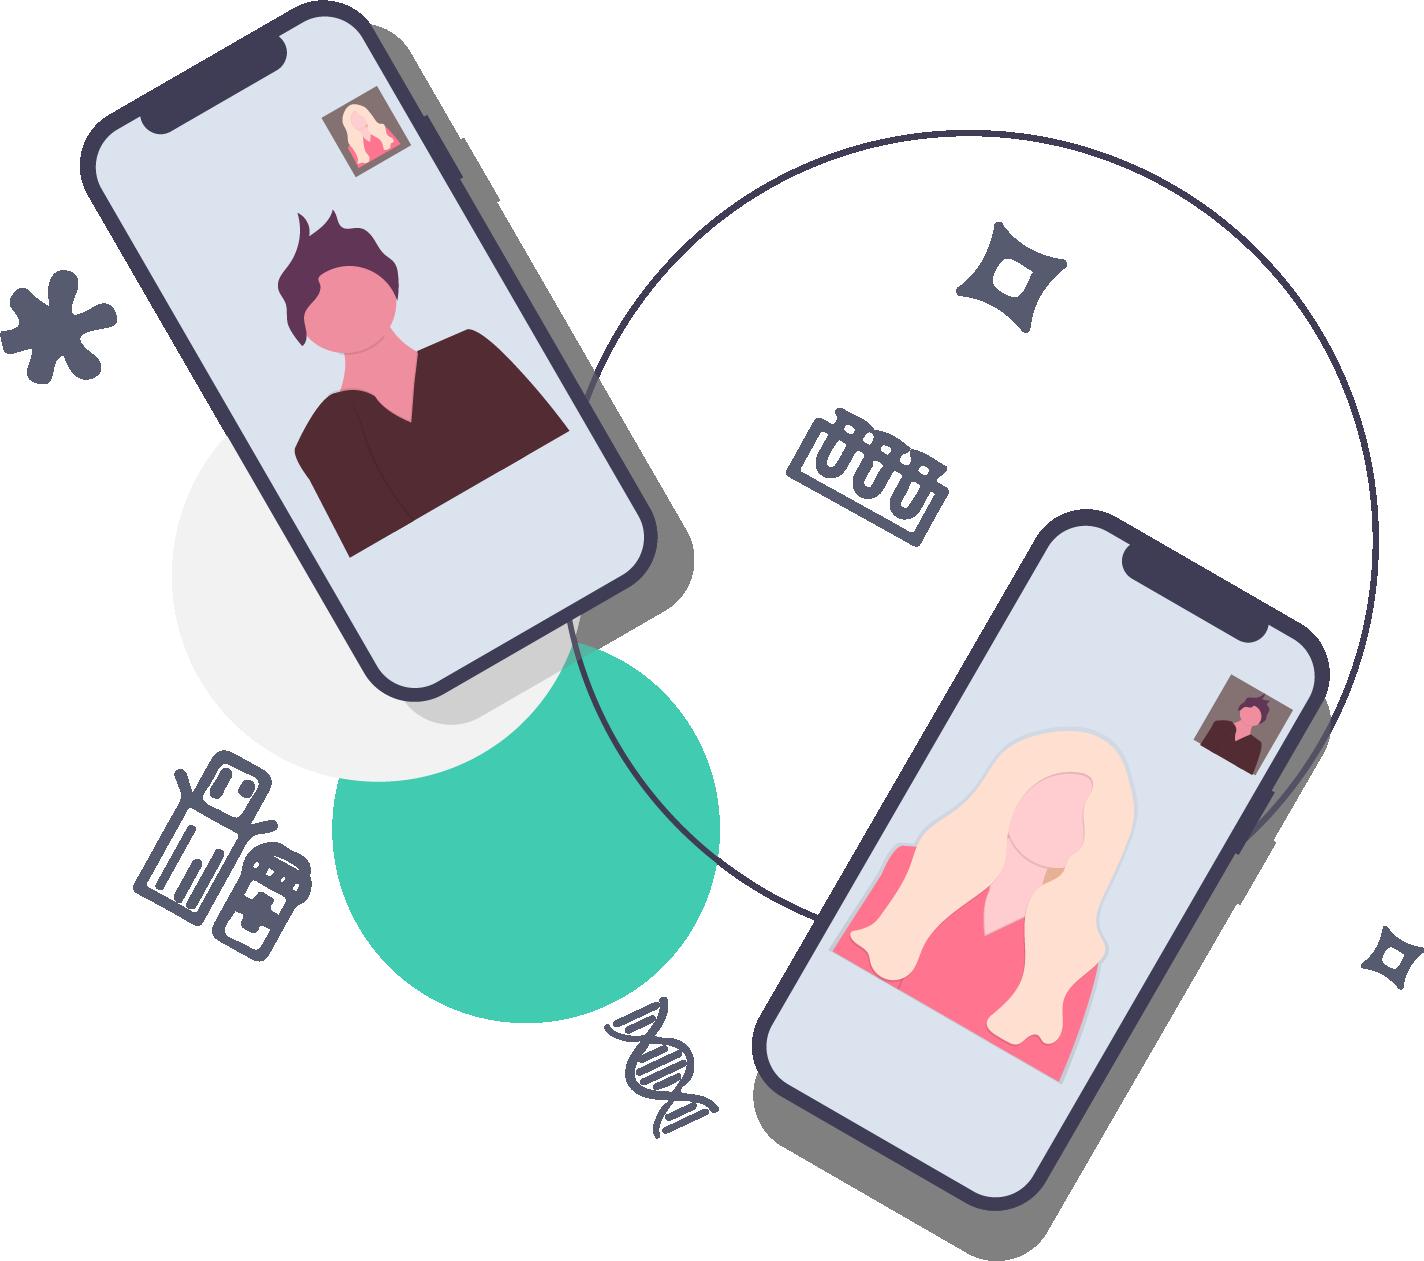 illustration of 2 phones